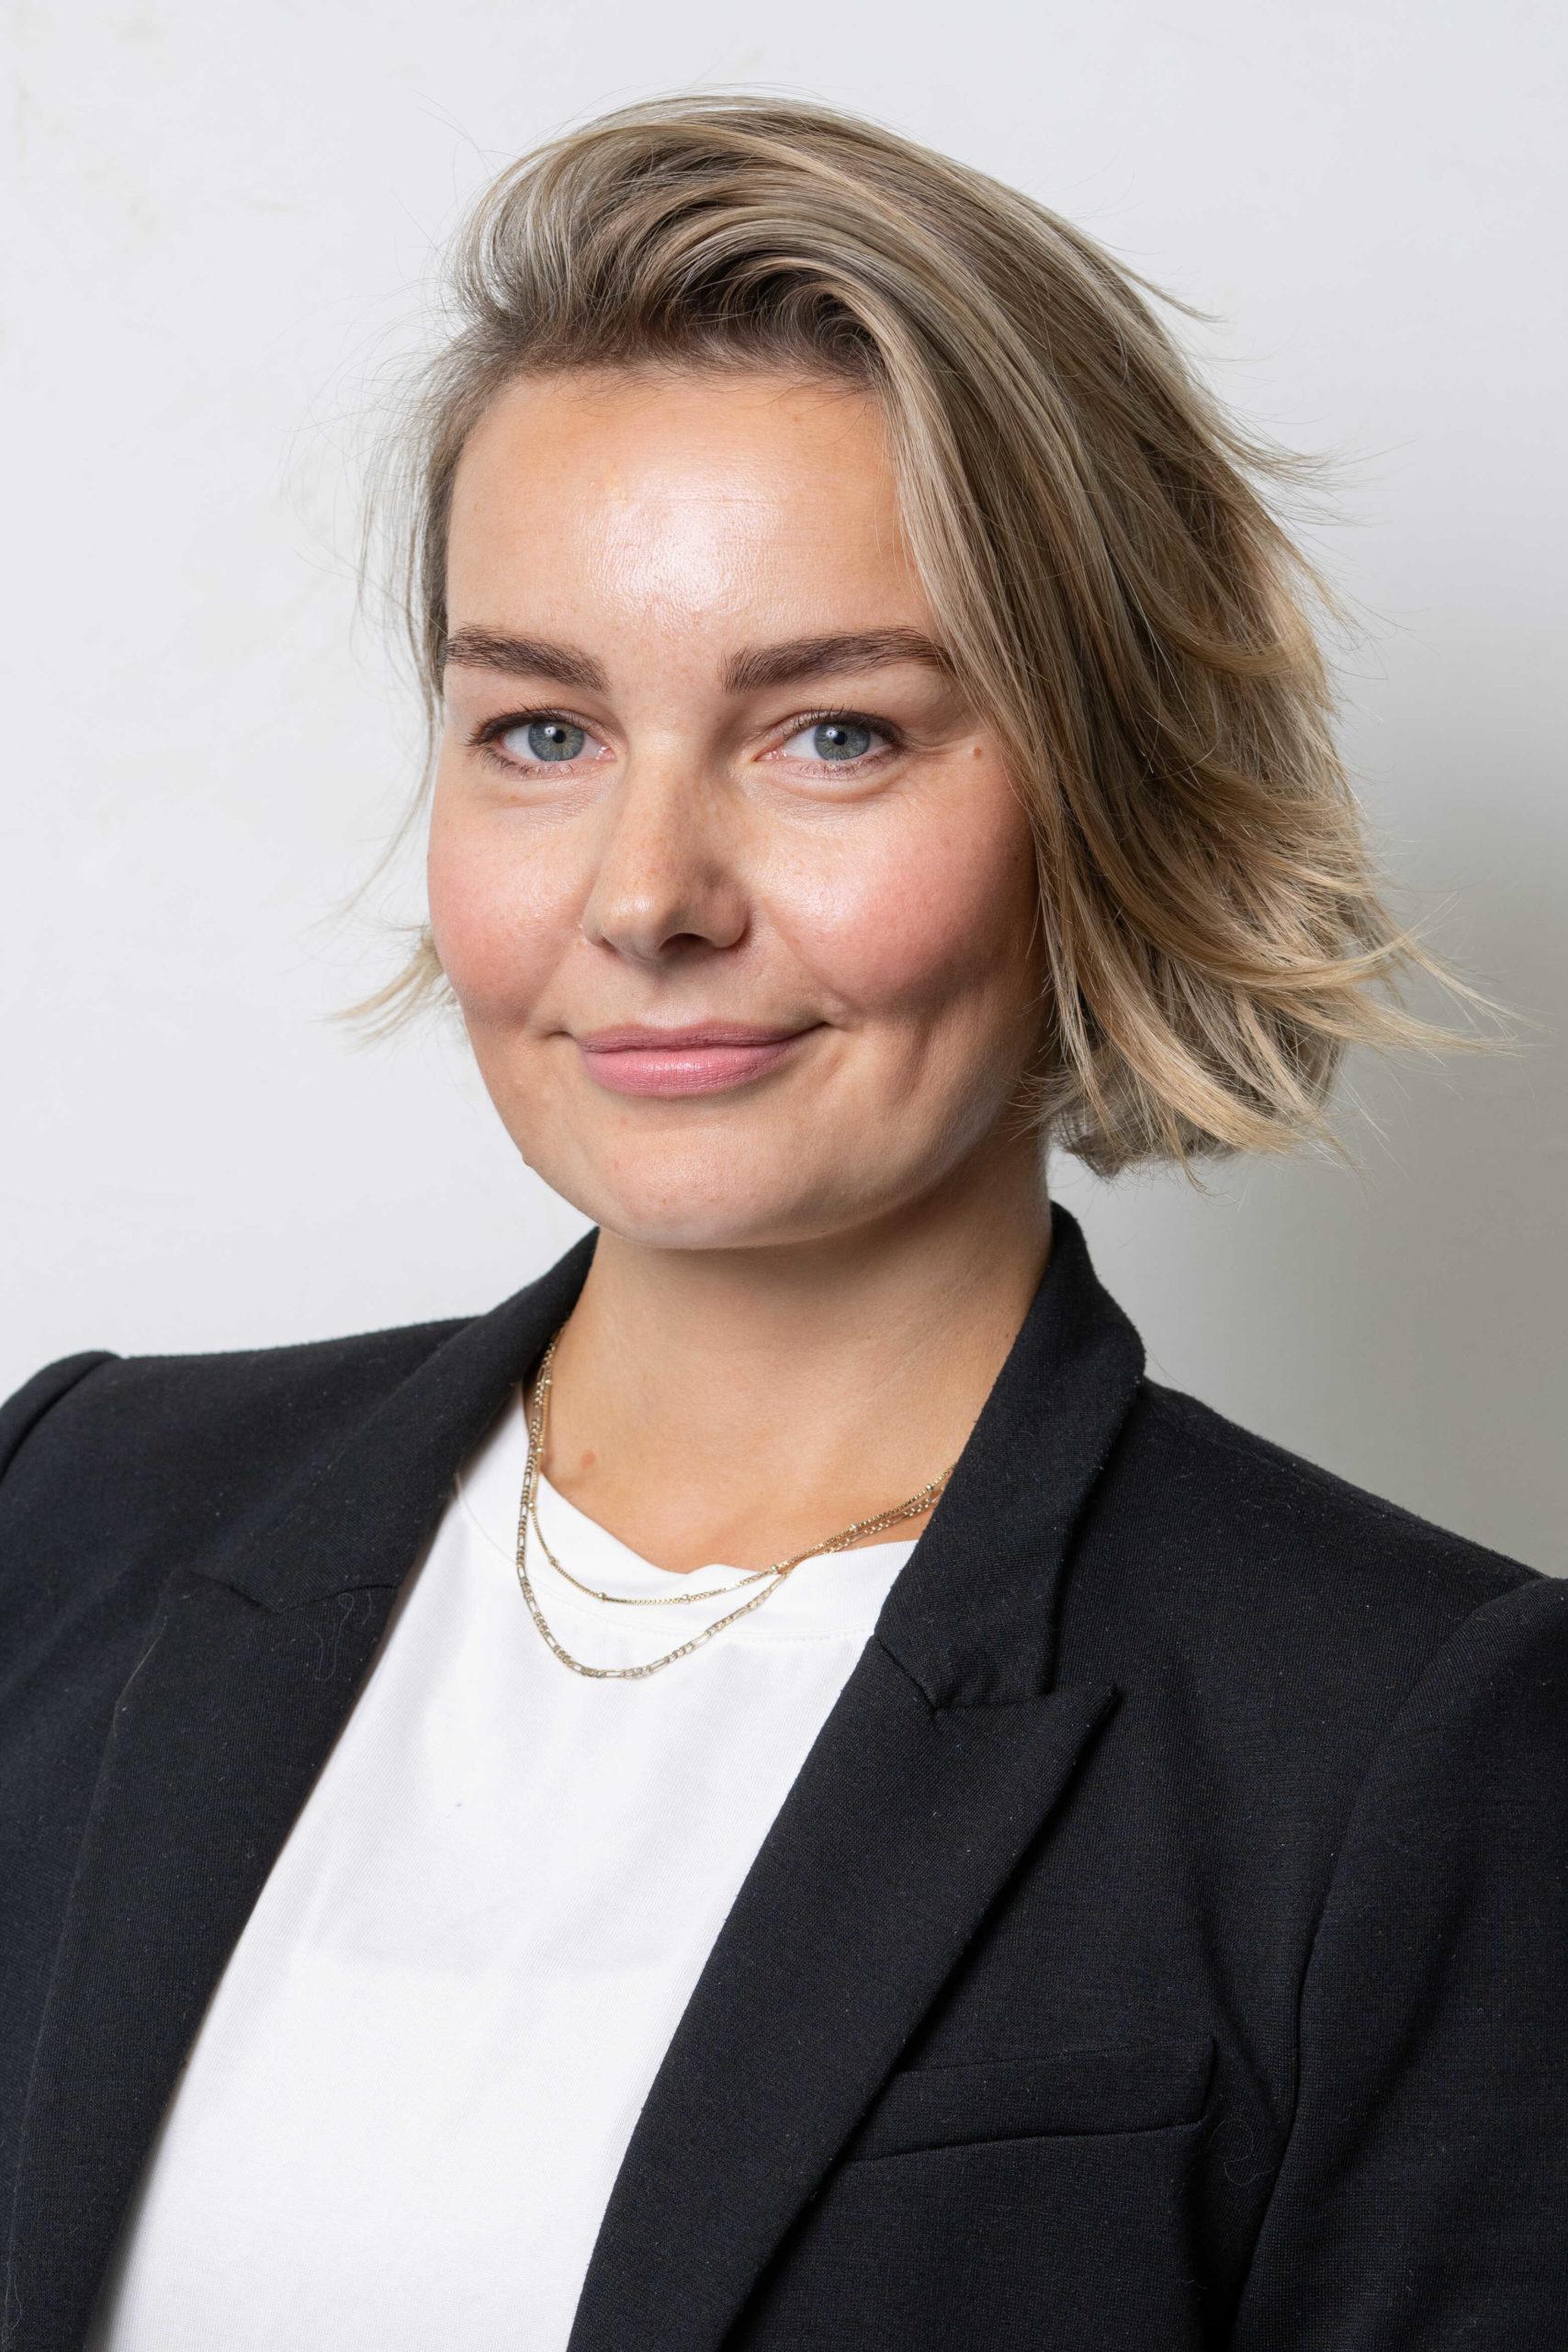 Noelle Klykken